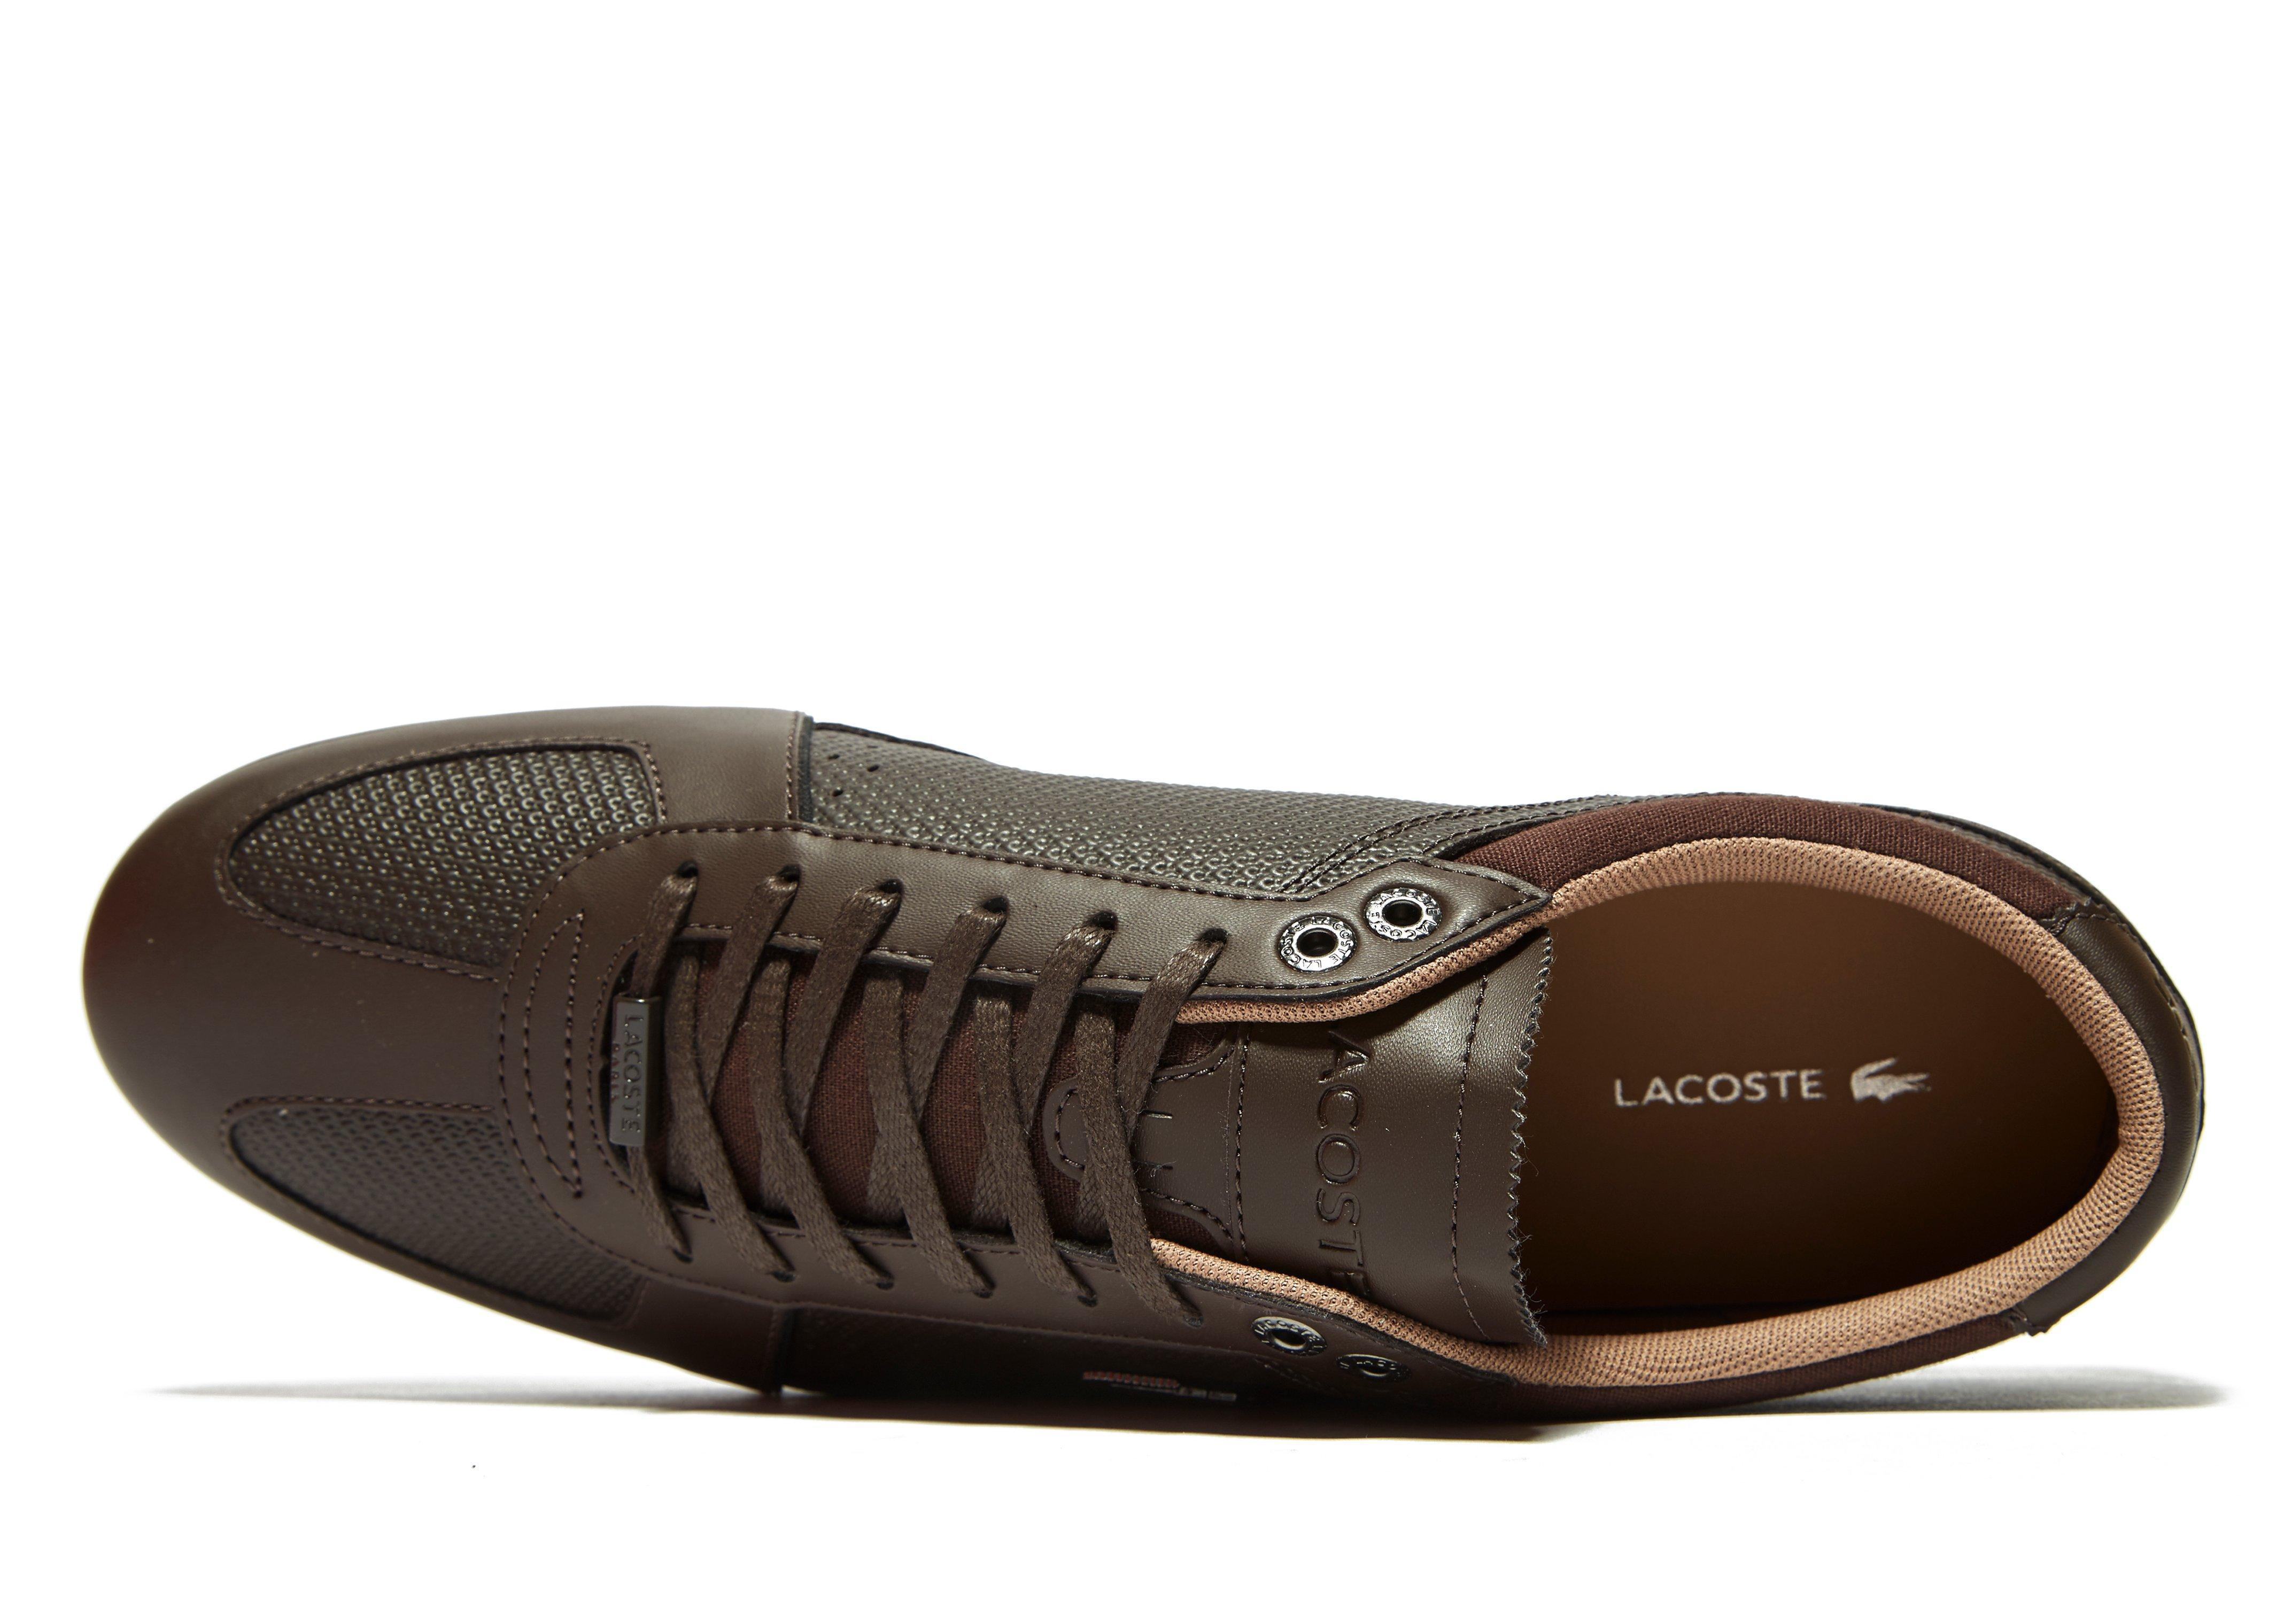 edeaff32ff82 Lacoste Evara in Brown for Men - Lyst